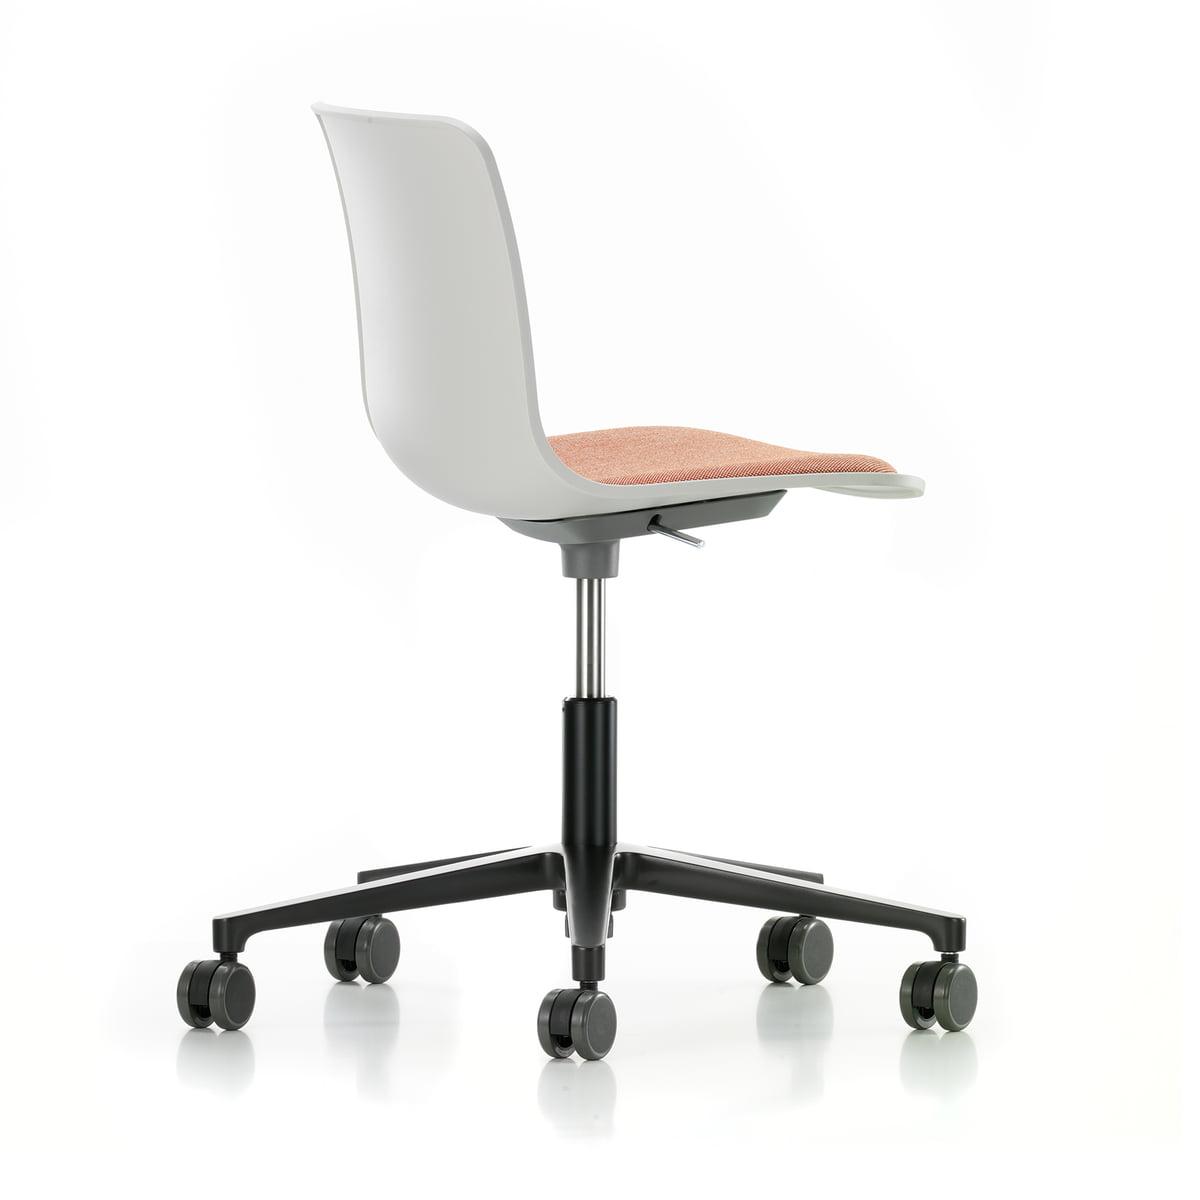 chaise de bureau pivotante hal studio vitra. Black Bedroom Furniture Sets. Home Design Ideas